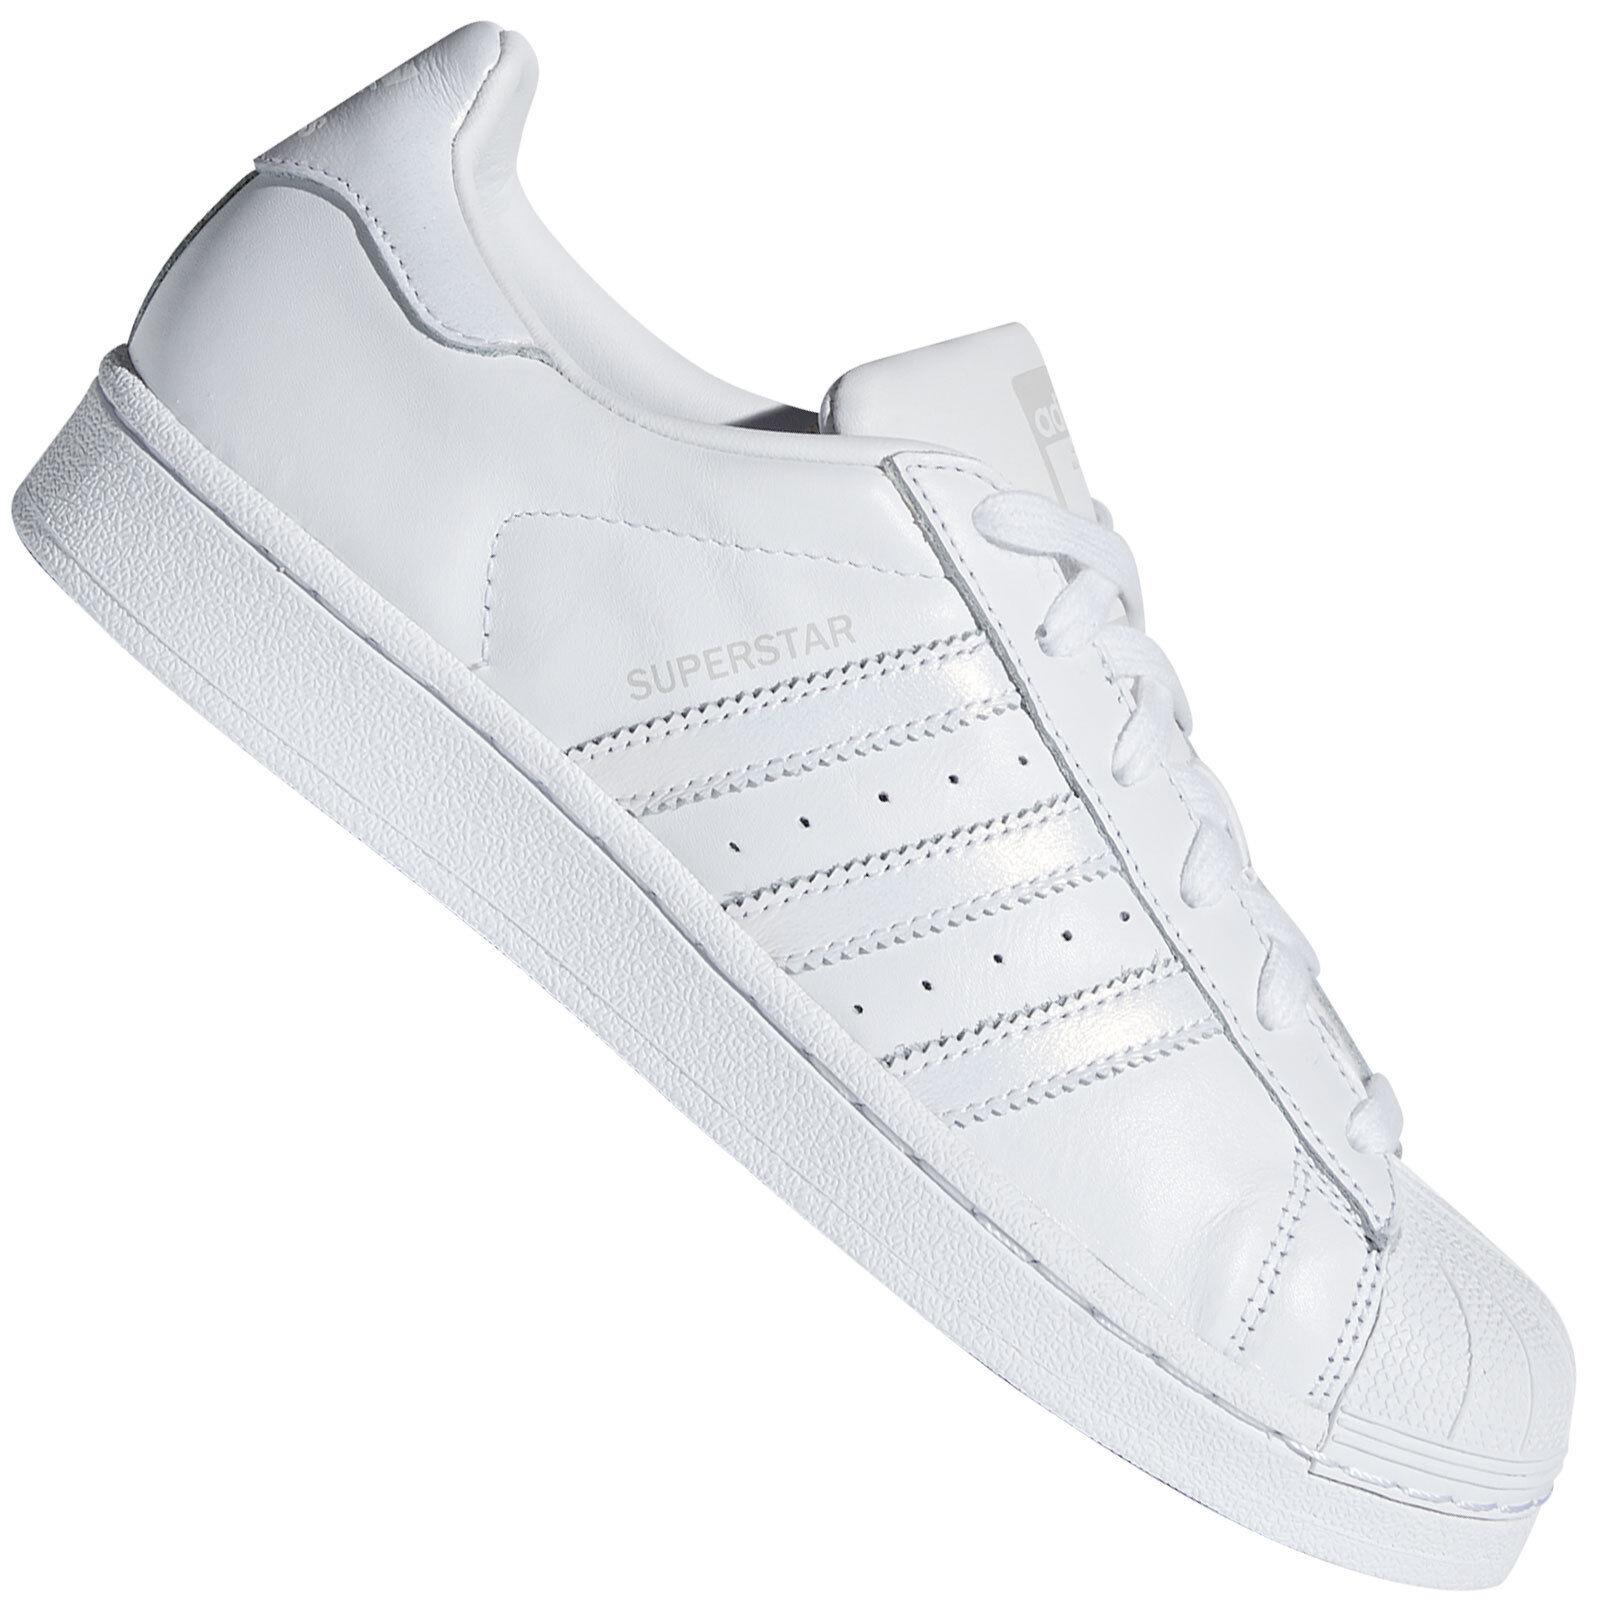 Adidas Originals Superstar Pearl W Sneaker Damen-Schuhe Turnschuhe Pearl Superstar Halbschuhe d45be6